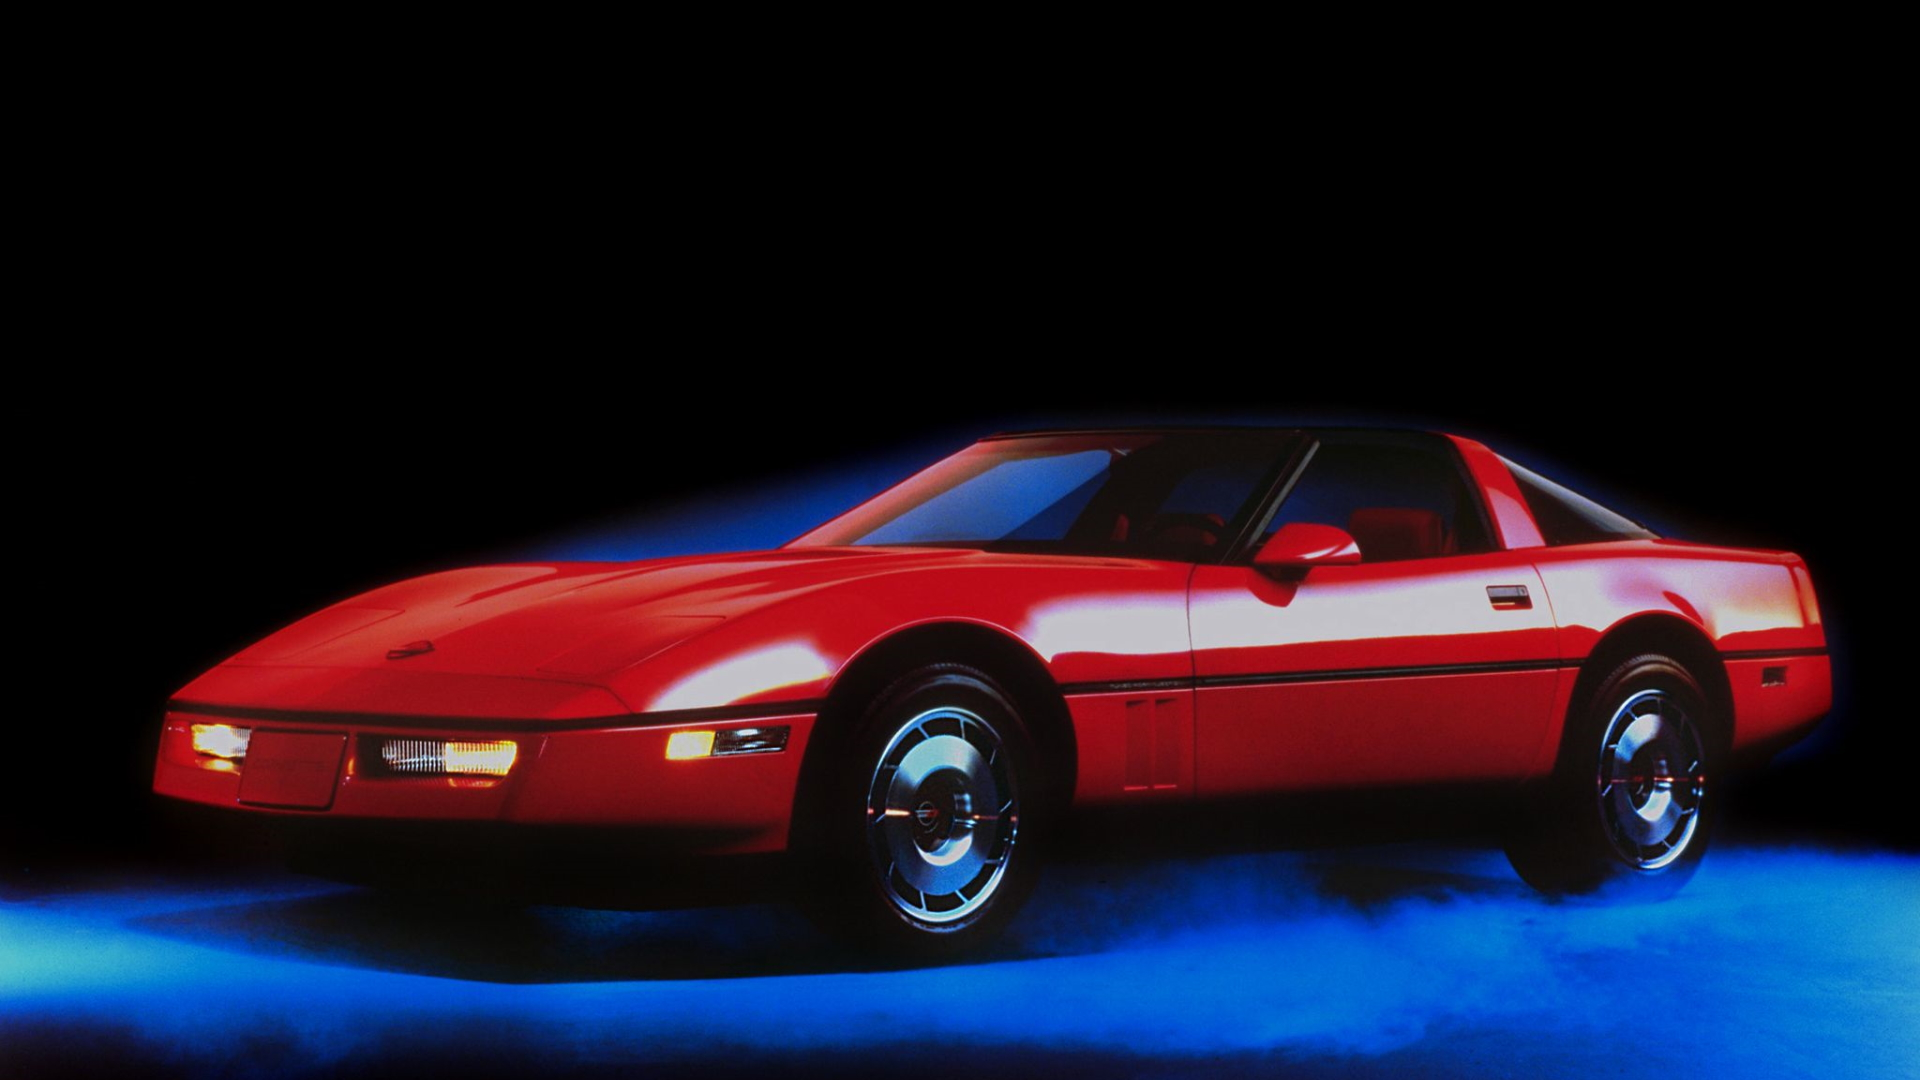 General 1920x1080 Chevrolet Corvette C4 80s cars red cars American cars car vehicle Chevrolet